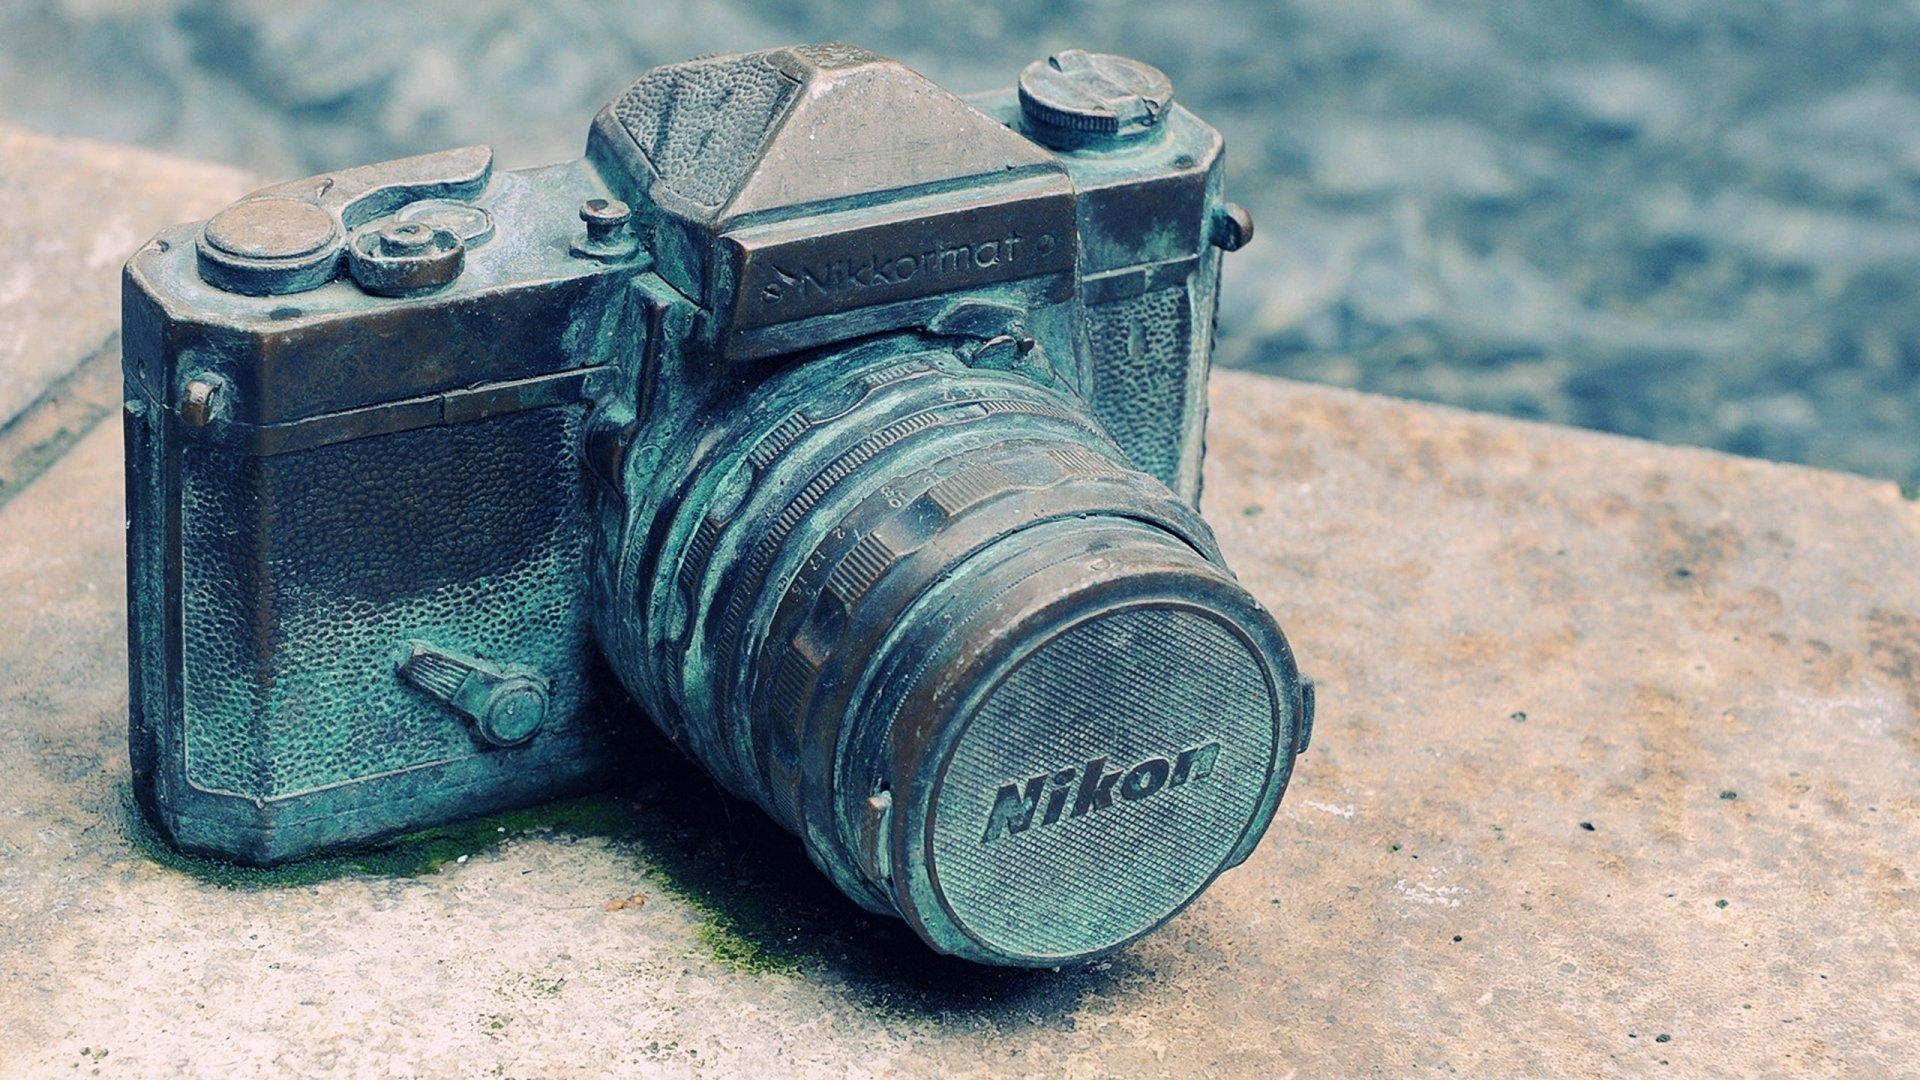 326 Camera HD Wallpapers